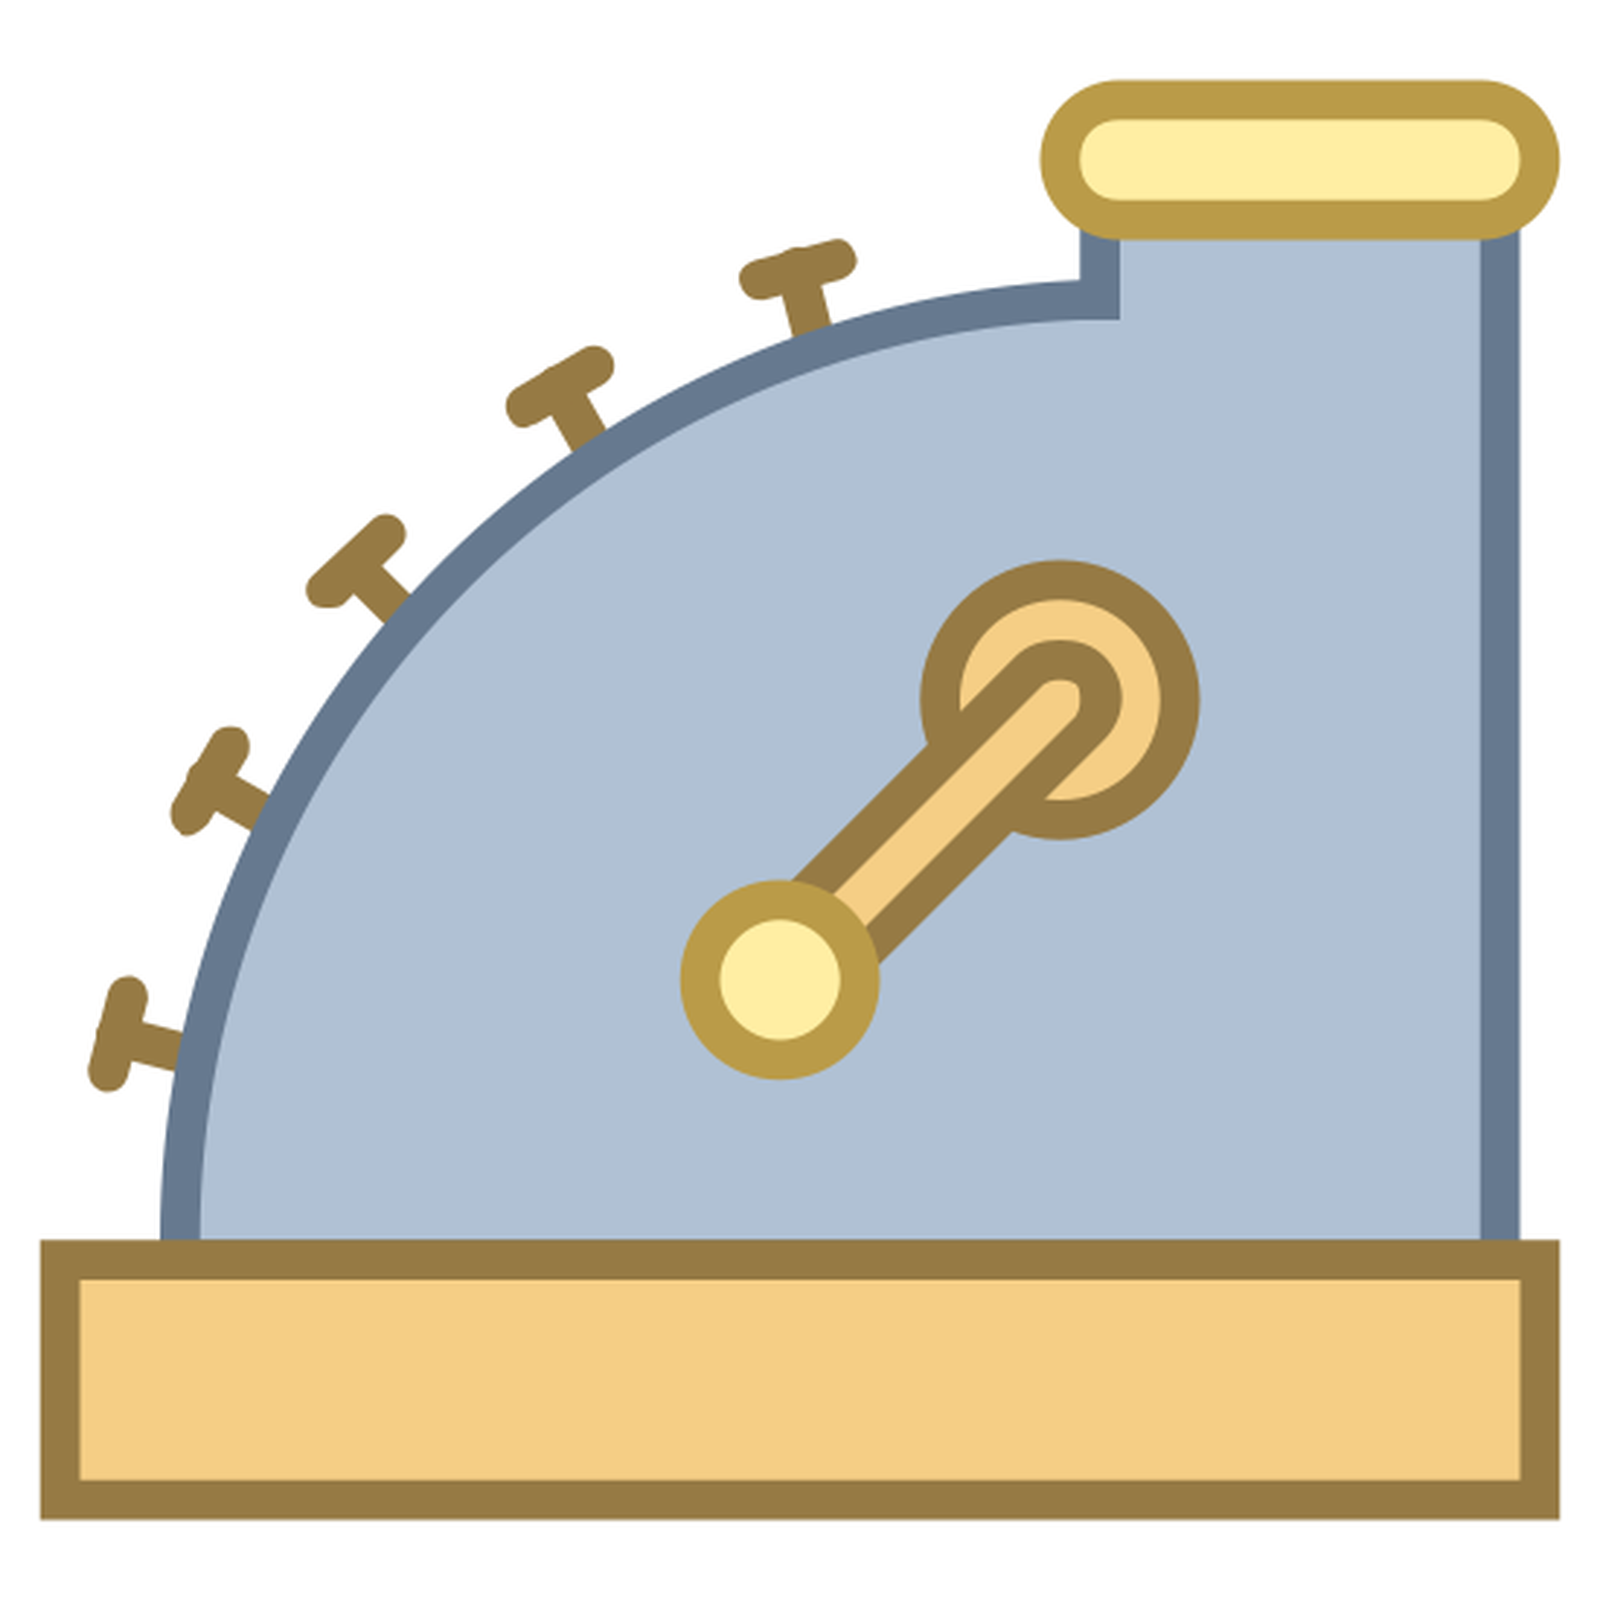 Registrierkasse icon